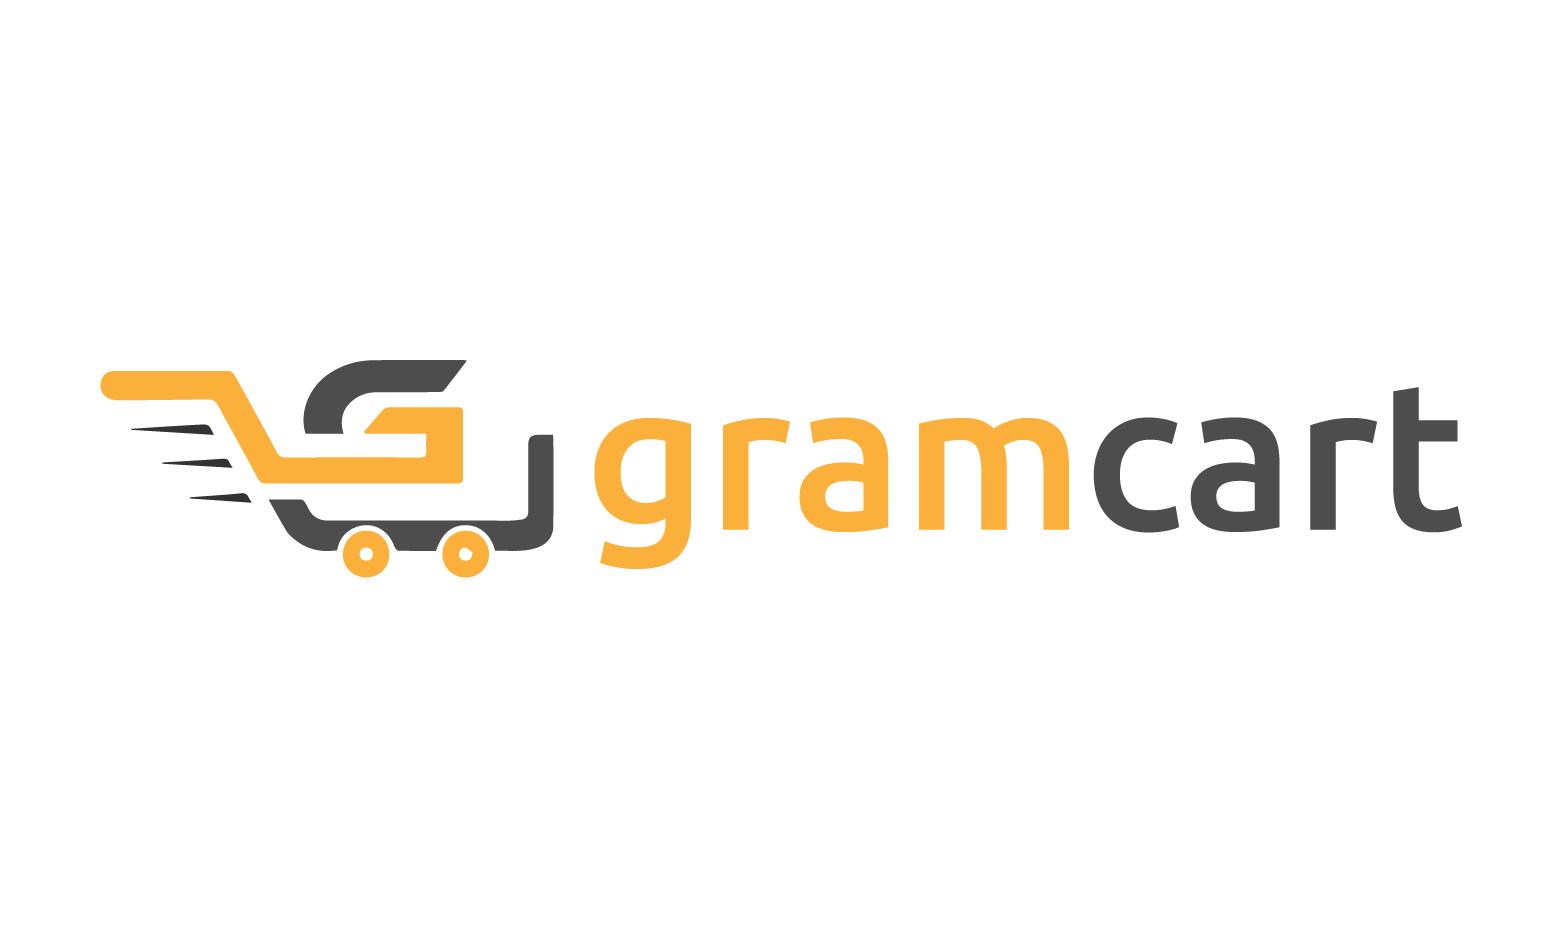 gramcart.com